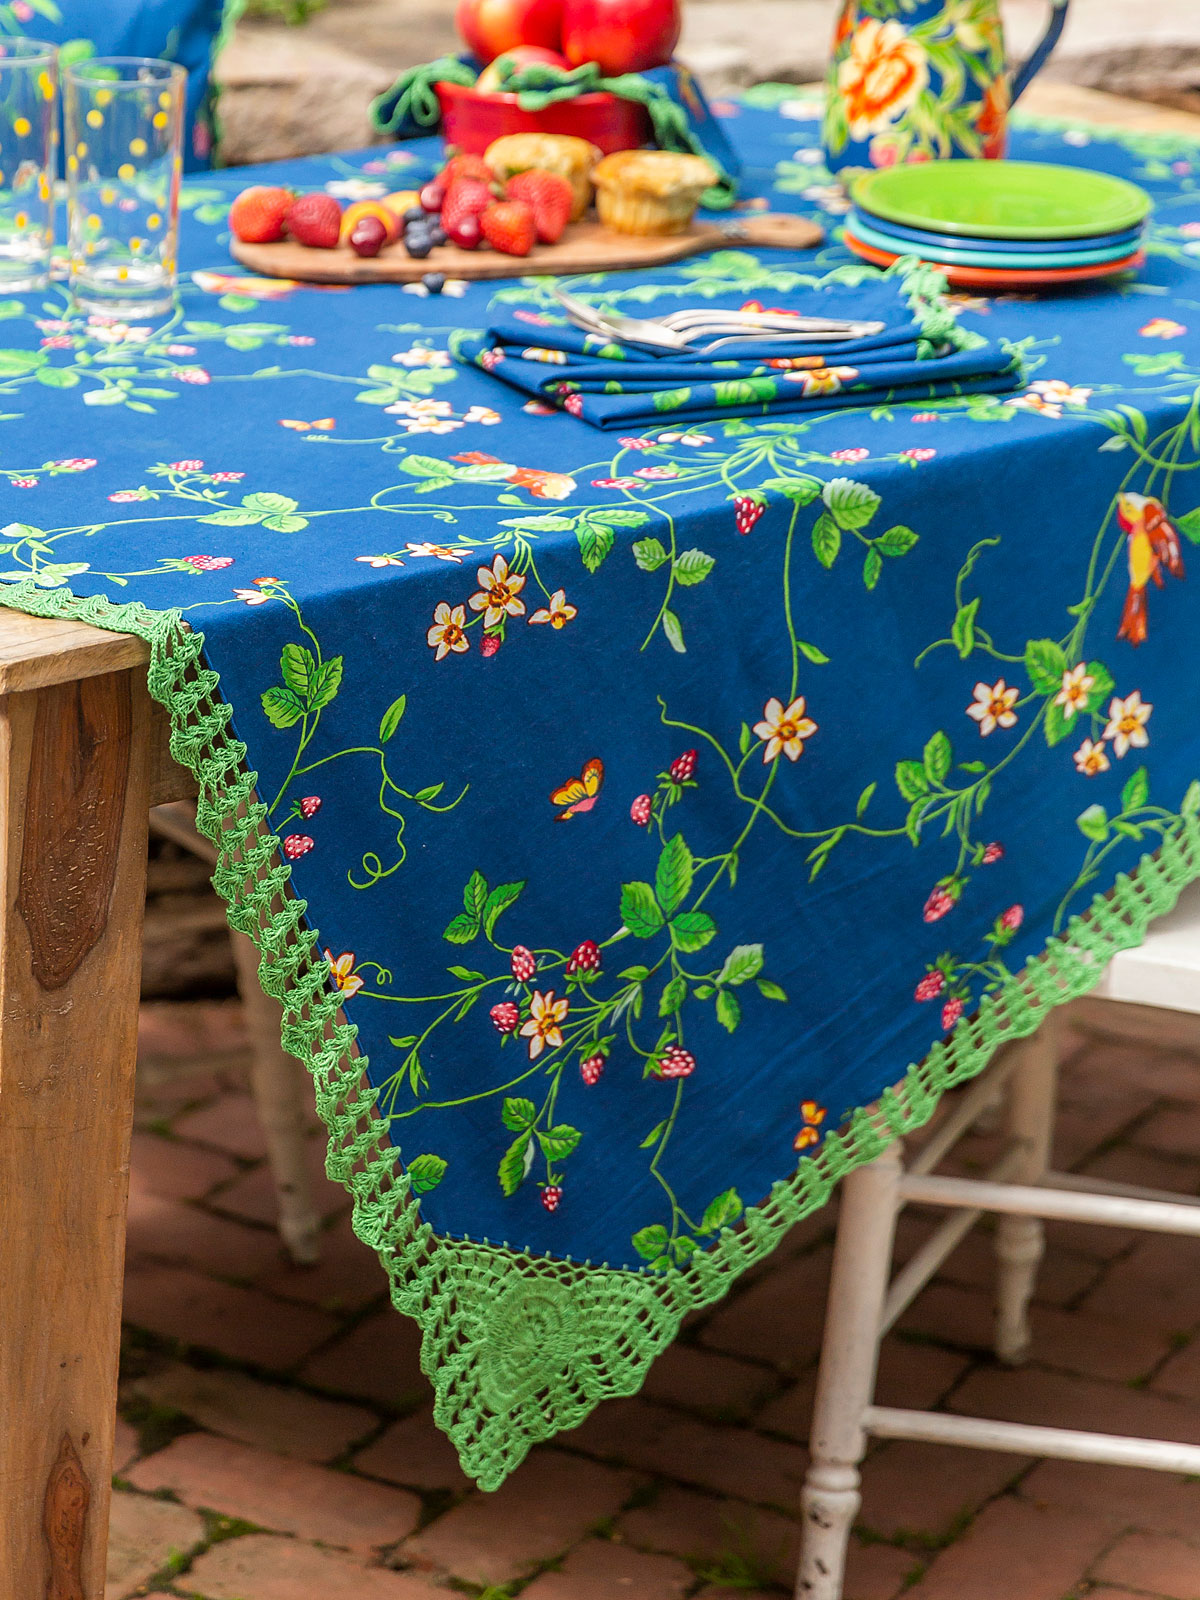 Strawberry Fields Crochet Tablecloth